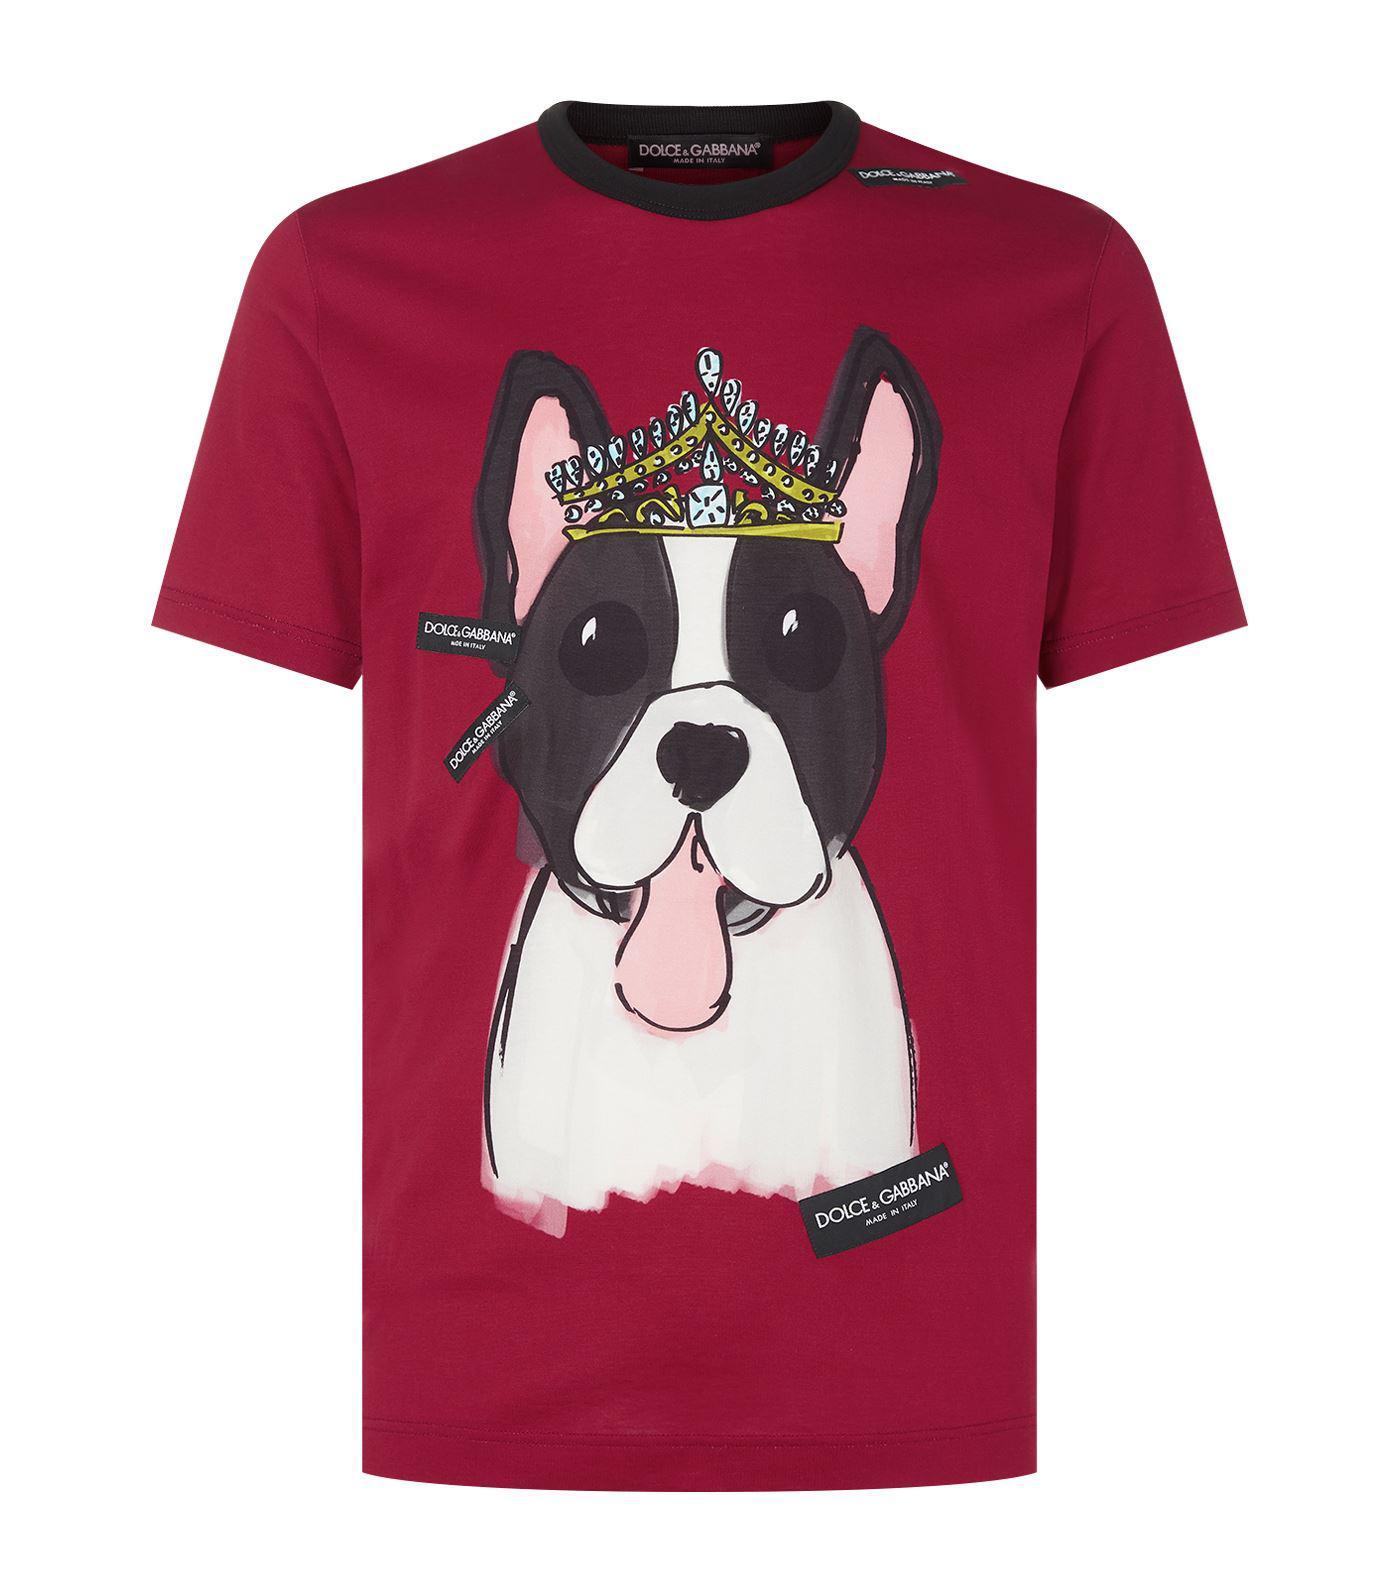 02e92f123b5cfc Lyst - Dolce   Gabbana Dog Print T-shirt in Red for Men